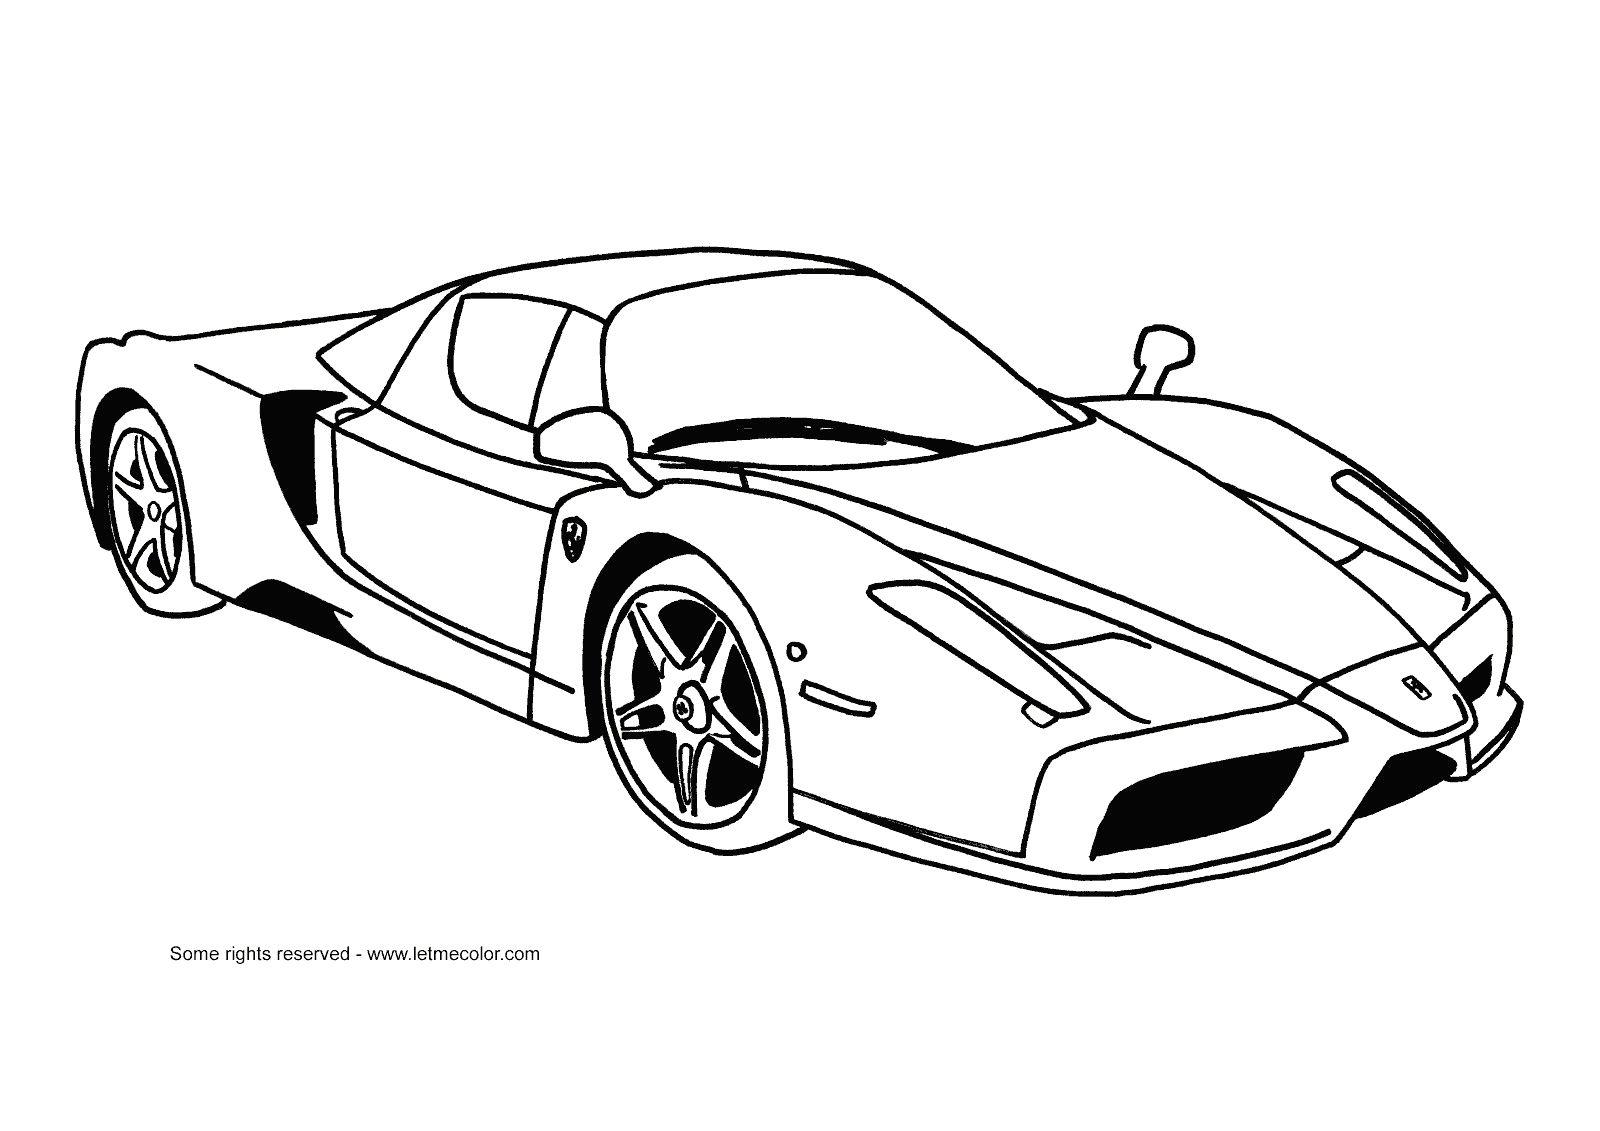 Ferrari Coloring Pages | Boyama Sayfaları, Araba, Resim concernant Ferrari A Colorier